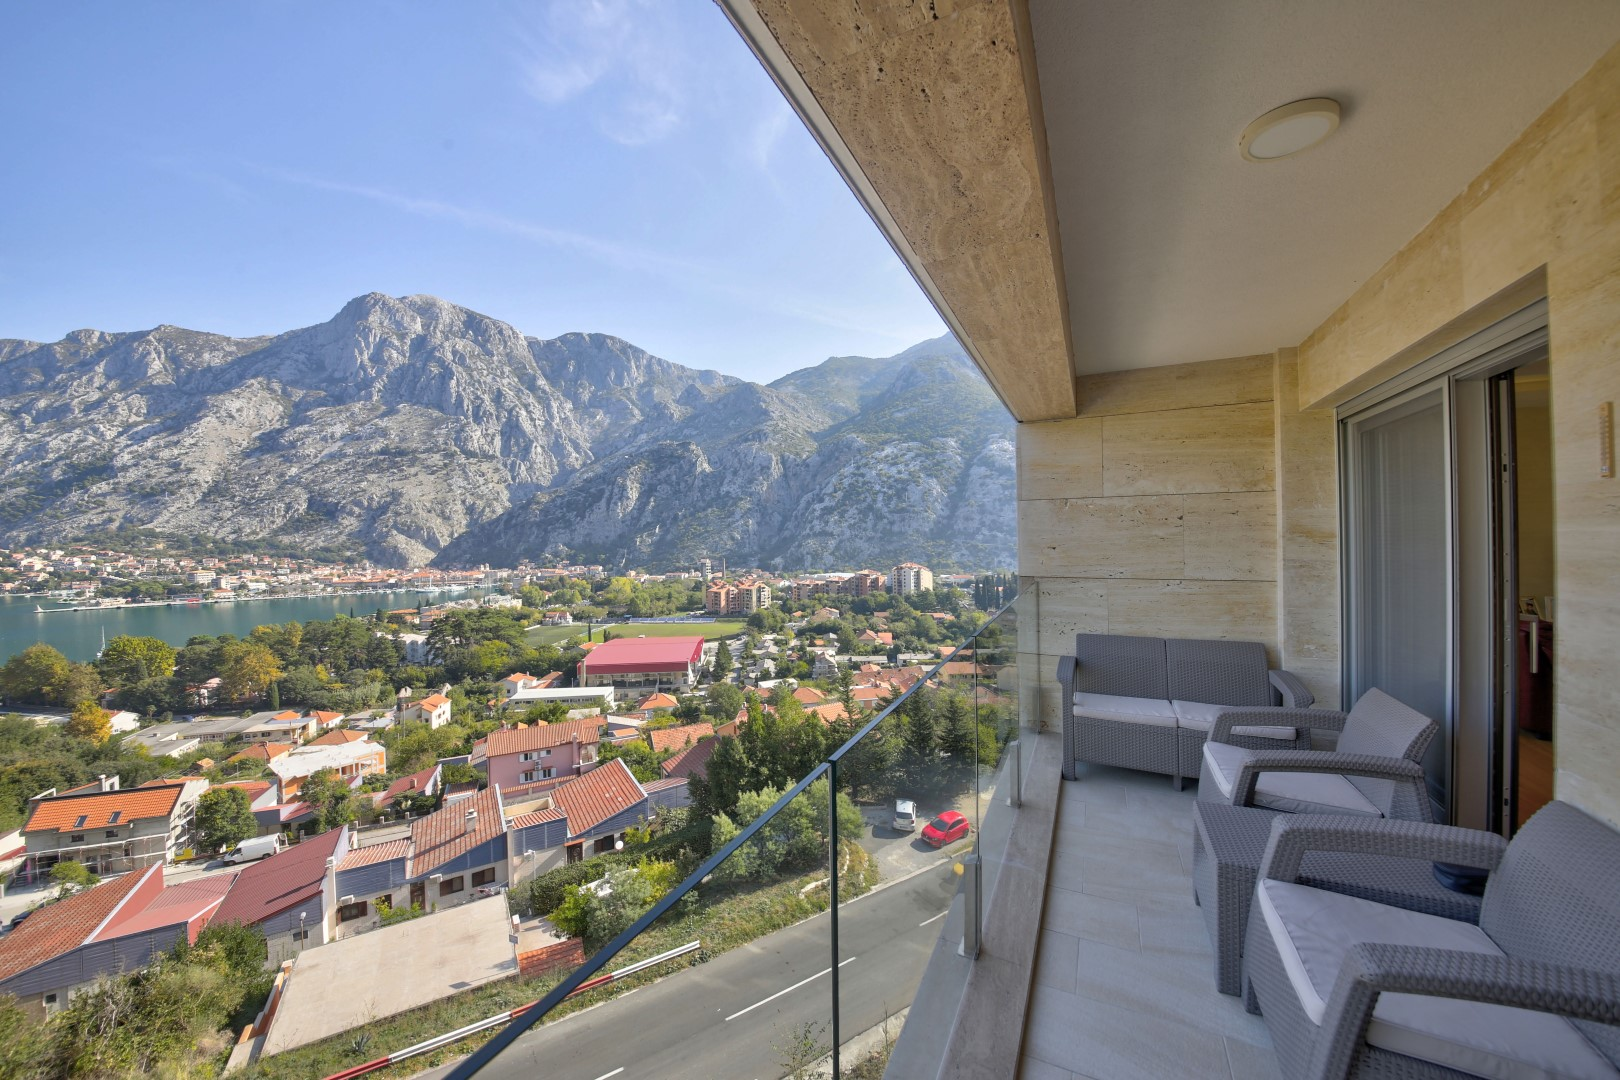 Котор, Шкальяри — четырехкомнатная квартира с панорамным видом на море и Стари-Град